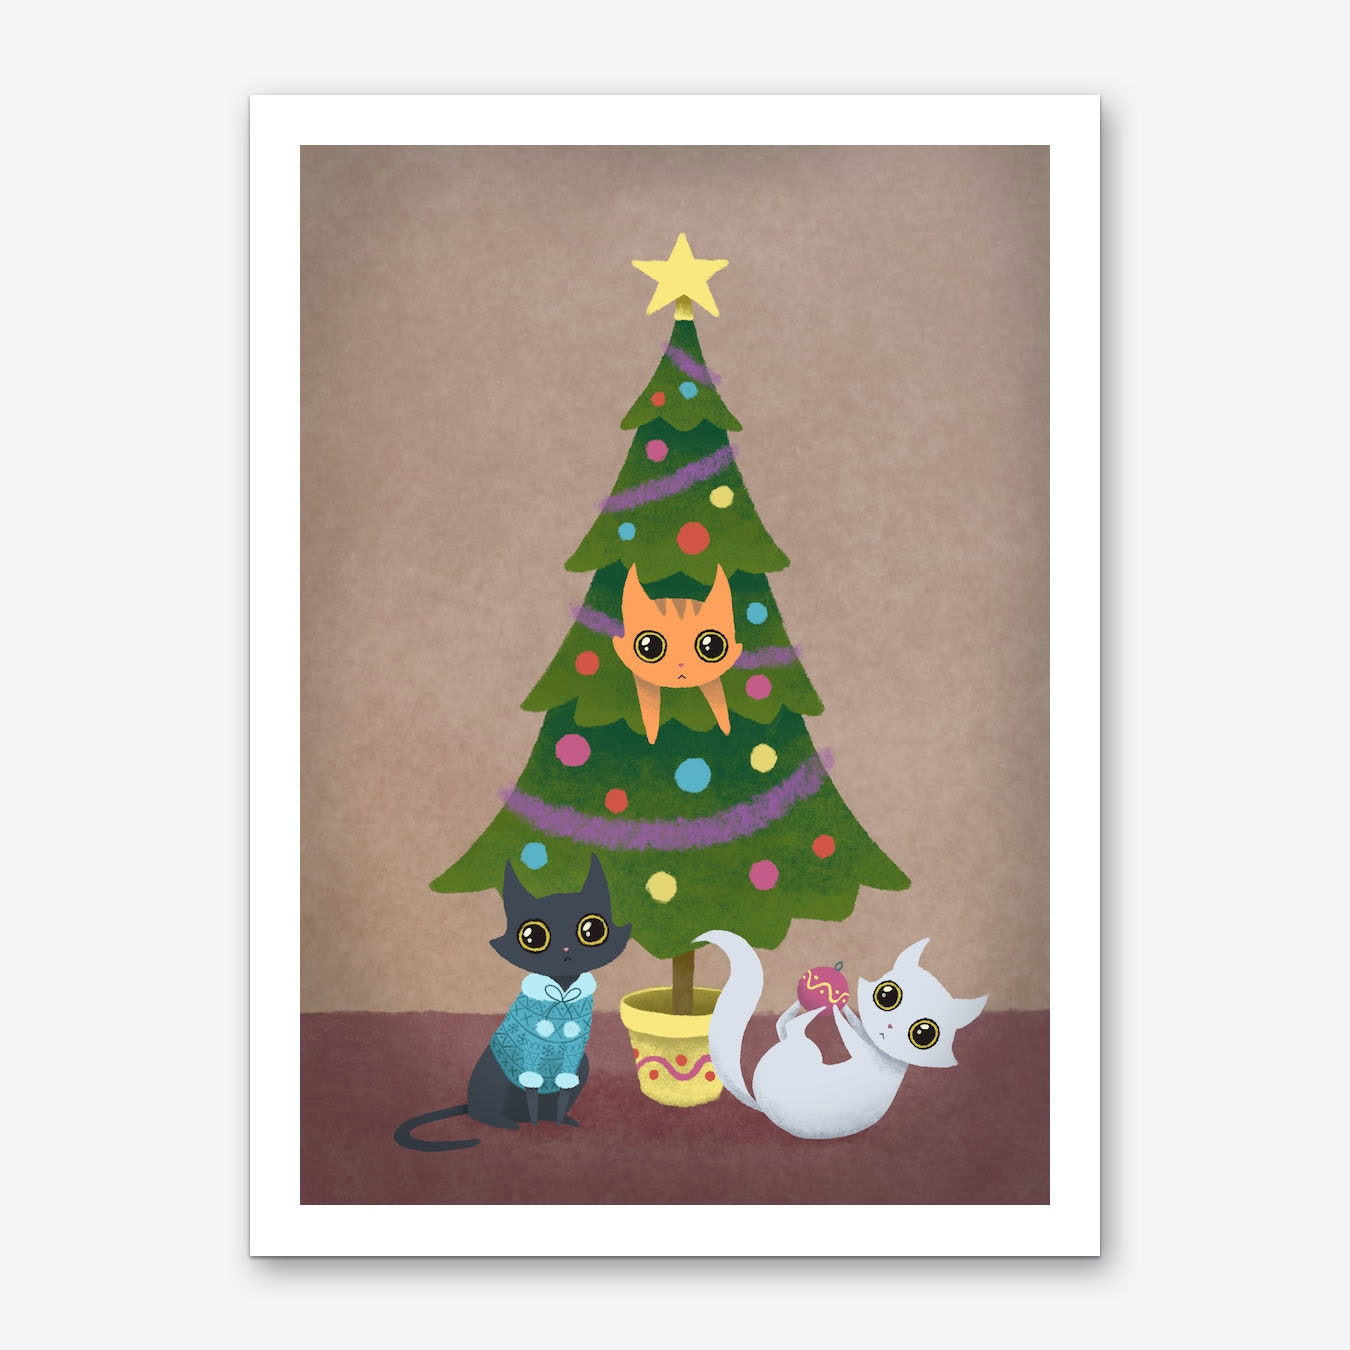 Meowy Christmas.Meowy Christmas Art Print